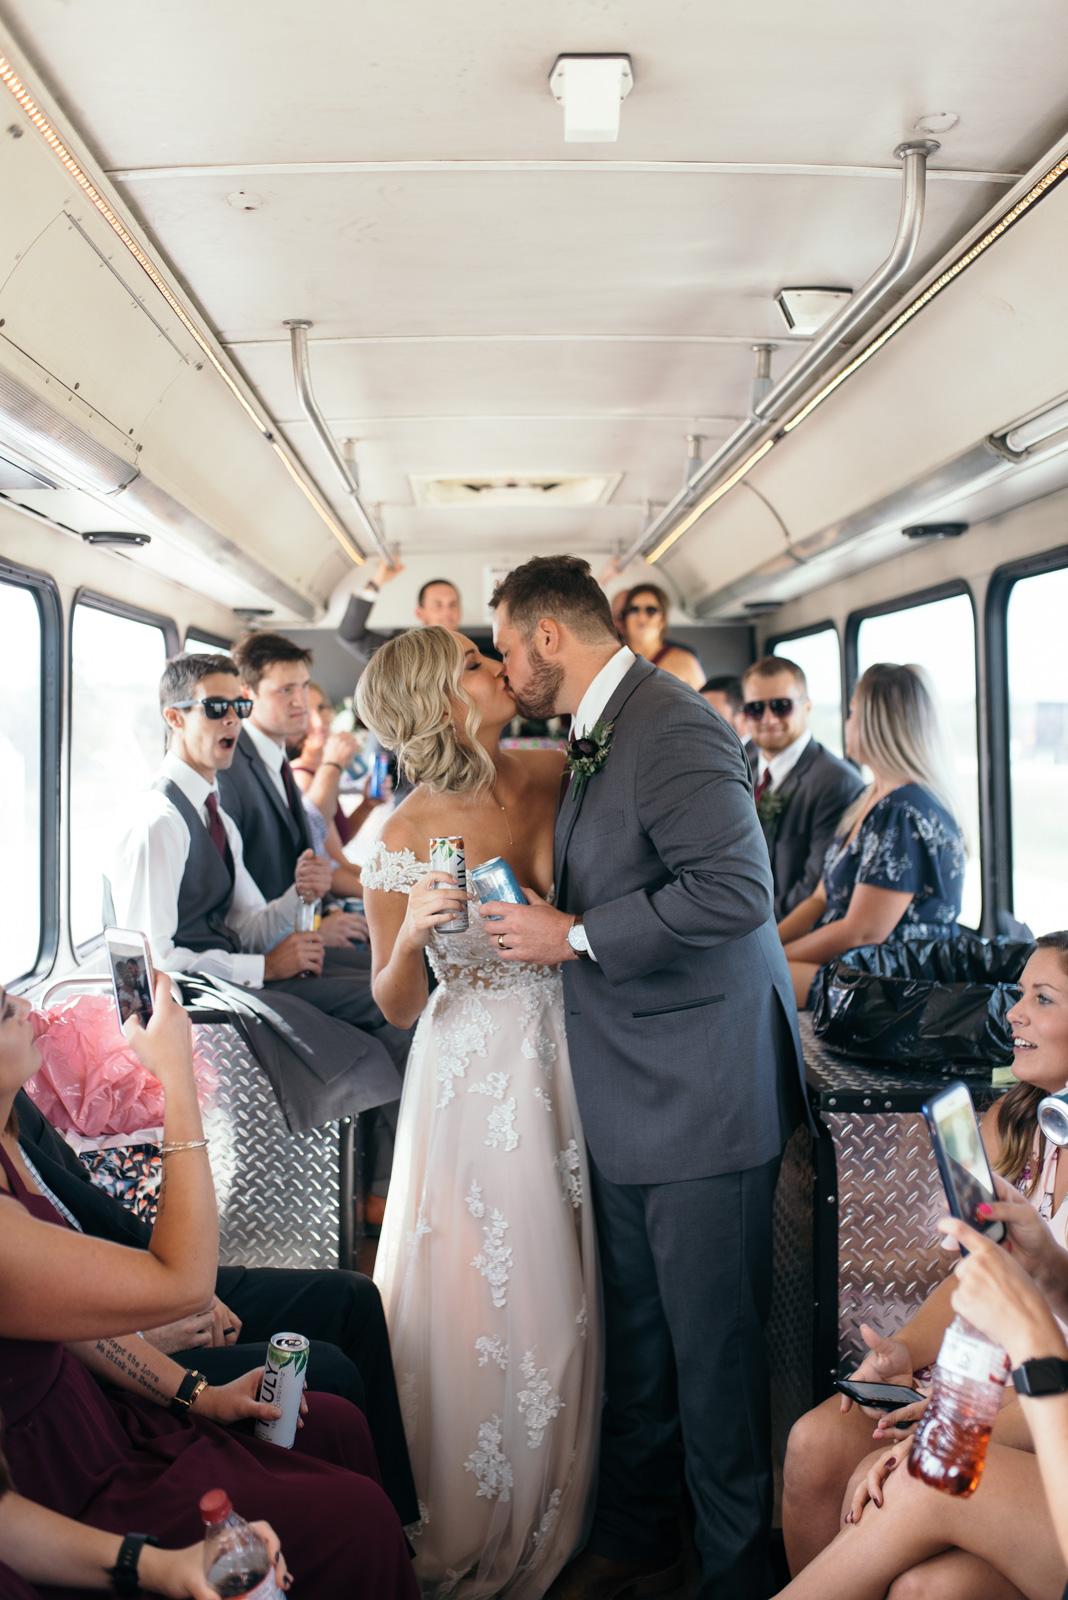 bride and groom kissing on cedar rapids wedding party bus